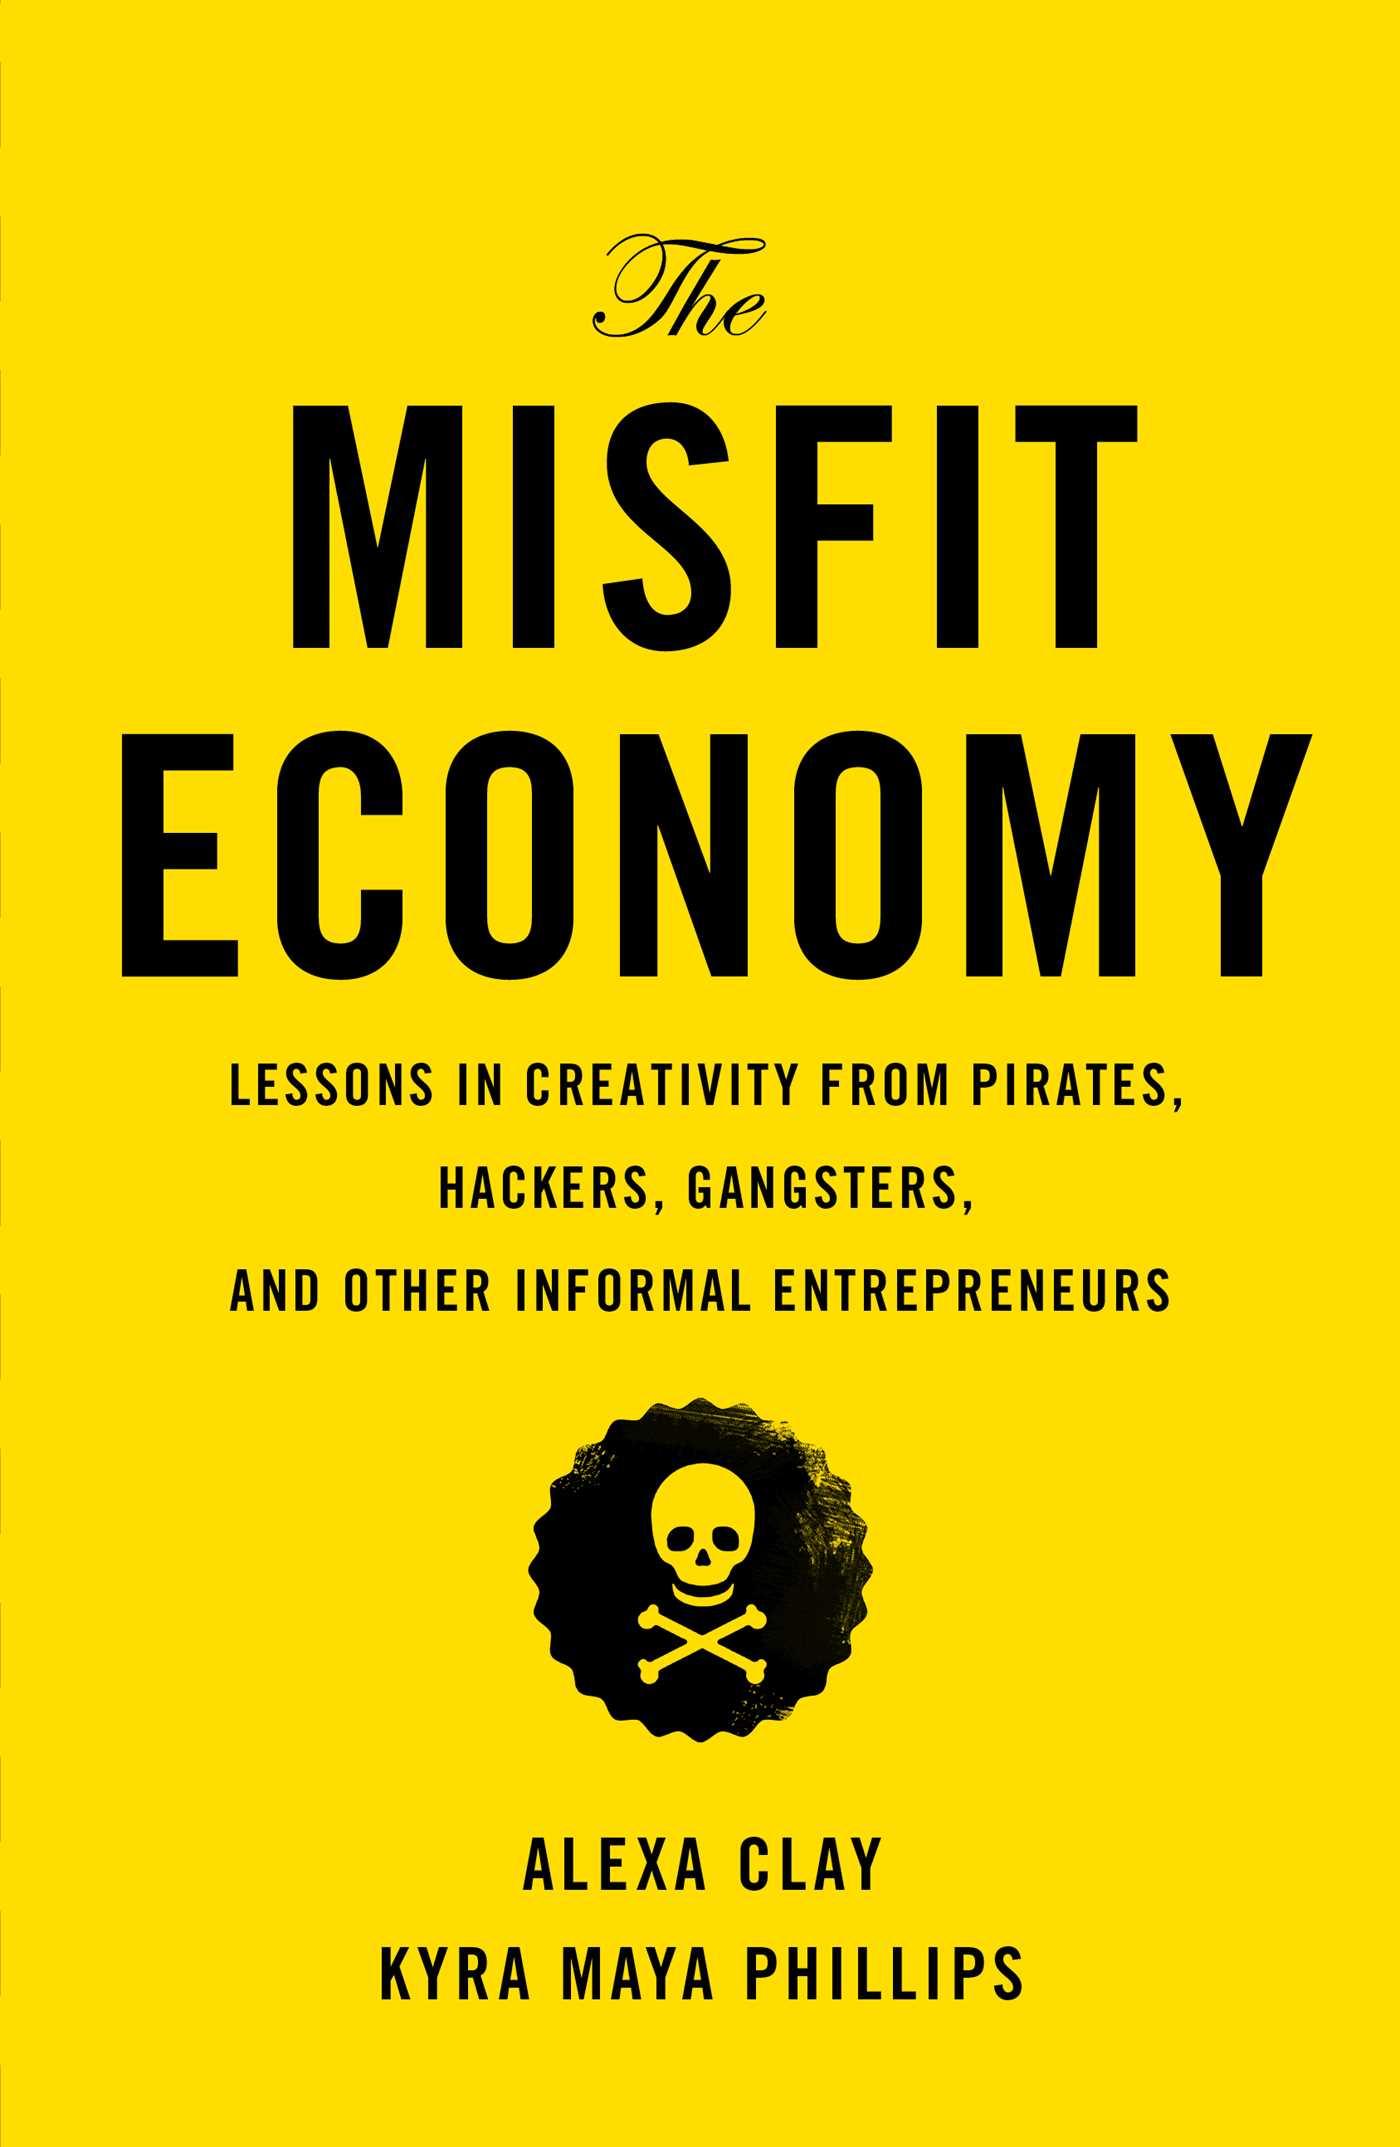 The misfit economy 9781451688825 hr